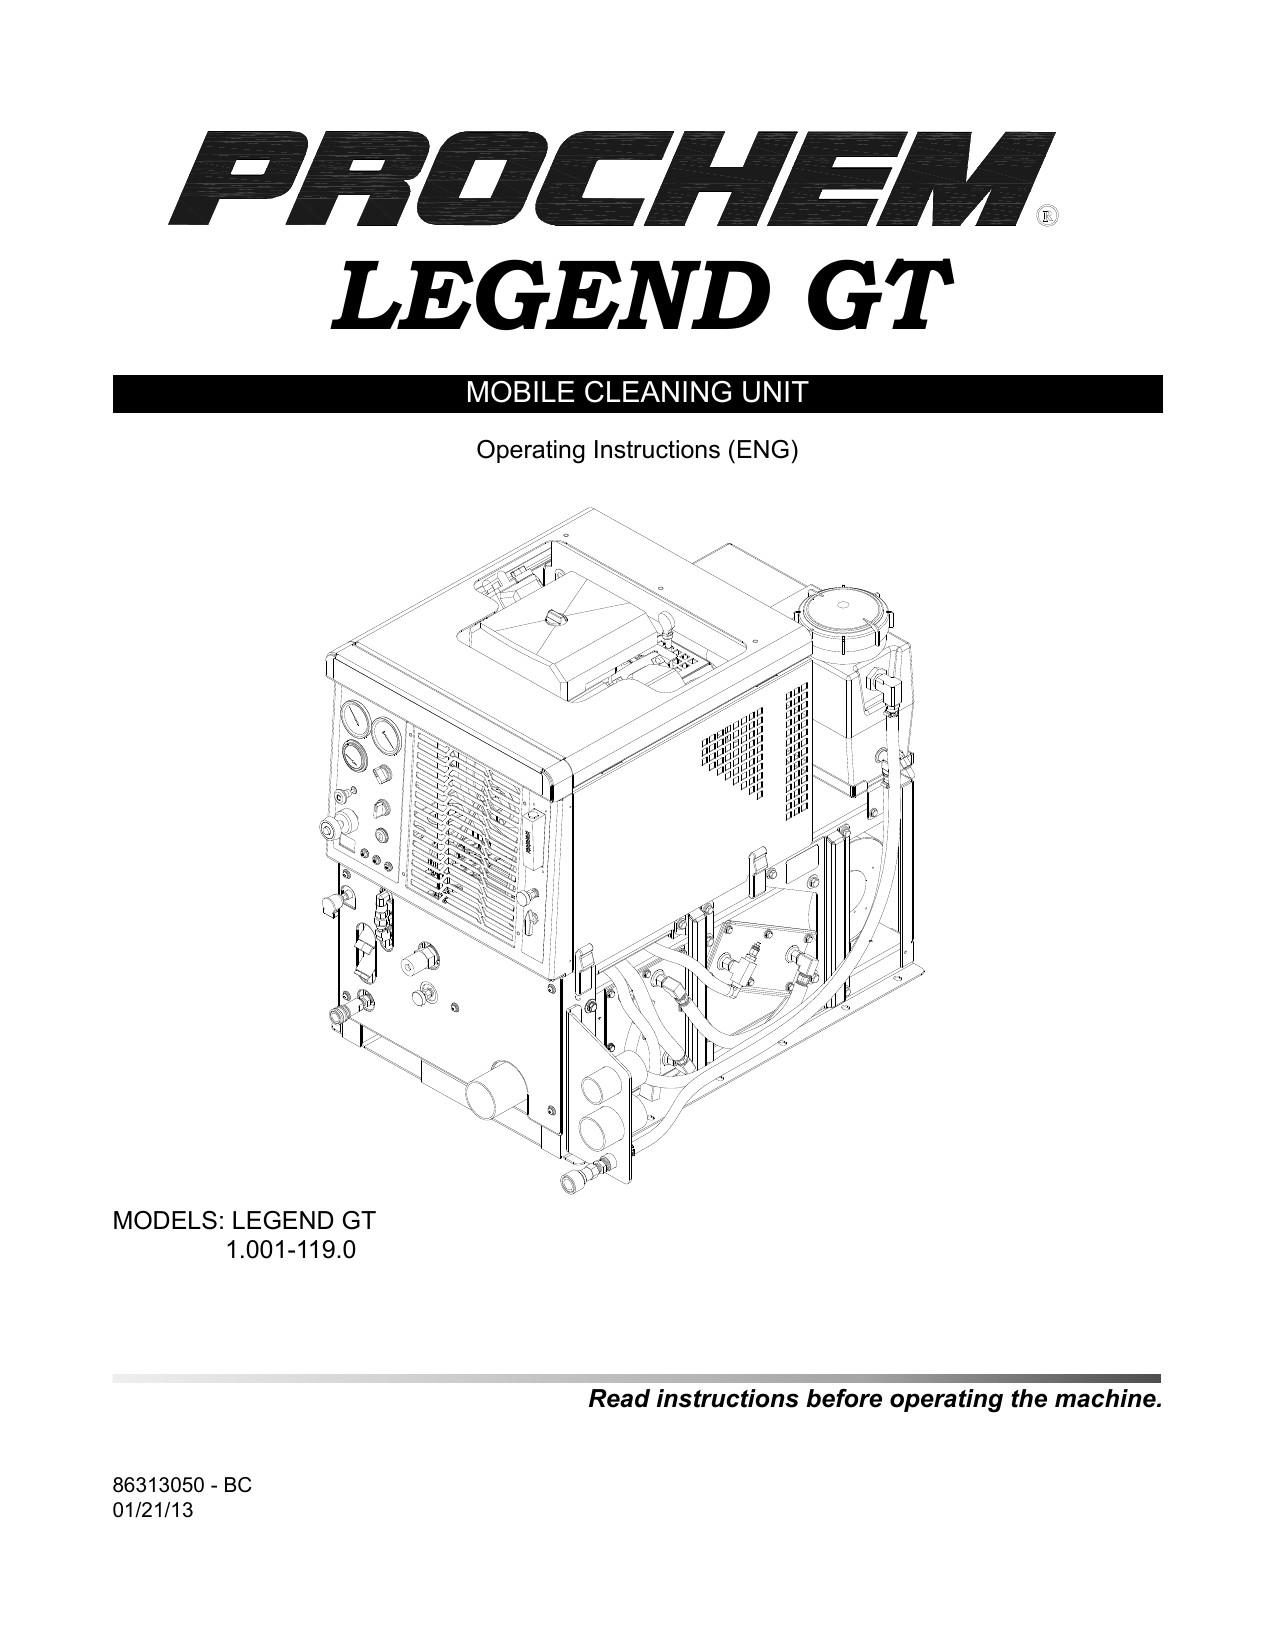 Qd Control Box Wiring Diagram Legend Gt Owners Manual Jon Don Of Qd Control Box Wiring Diagram